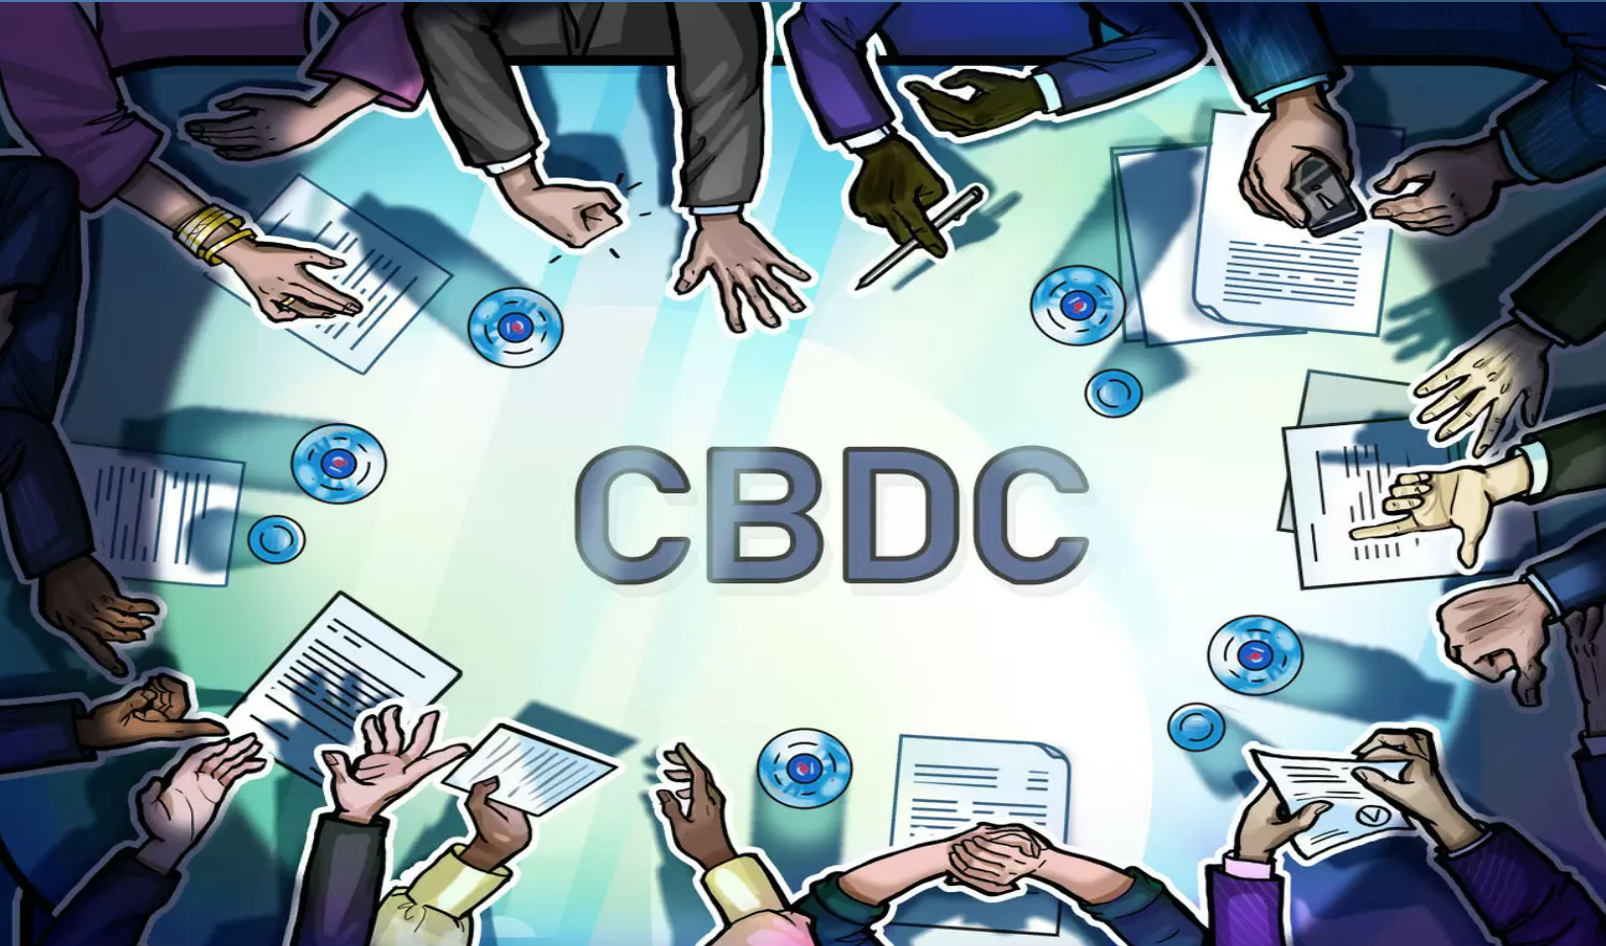 Cbdc's